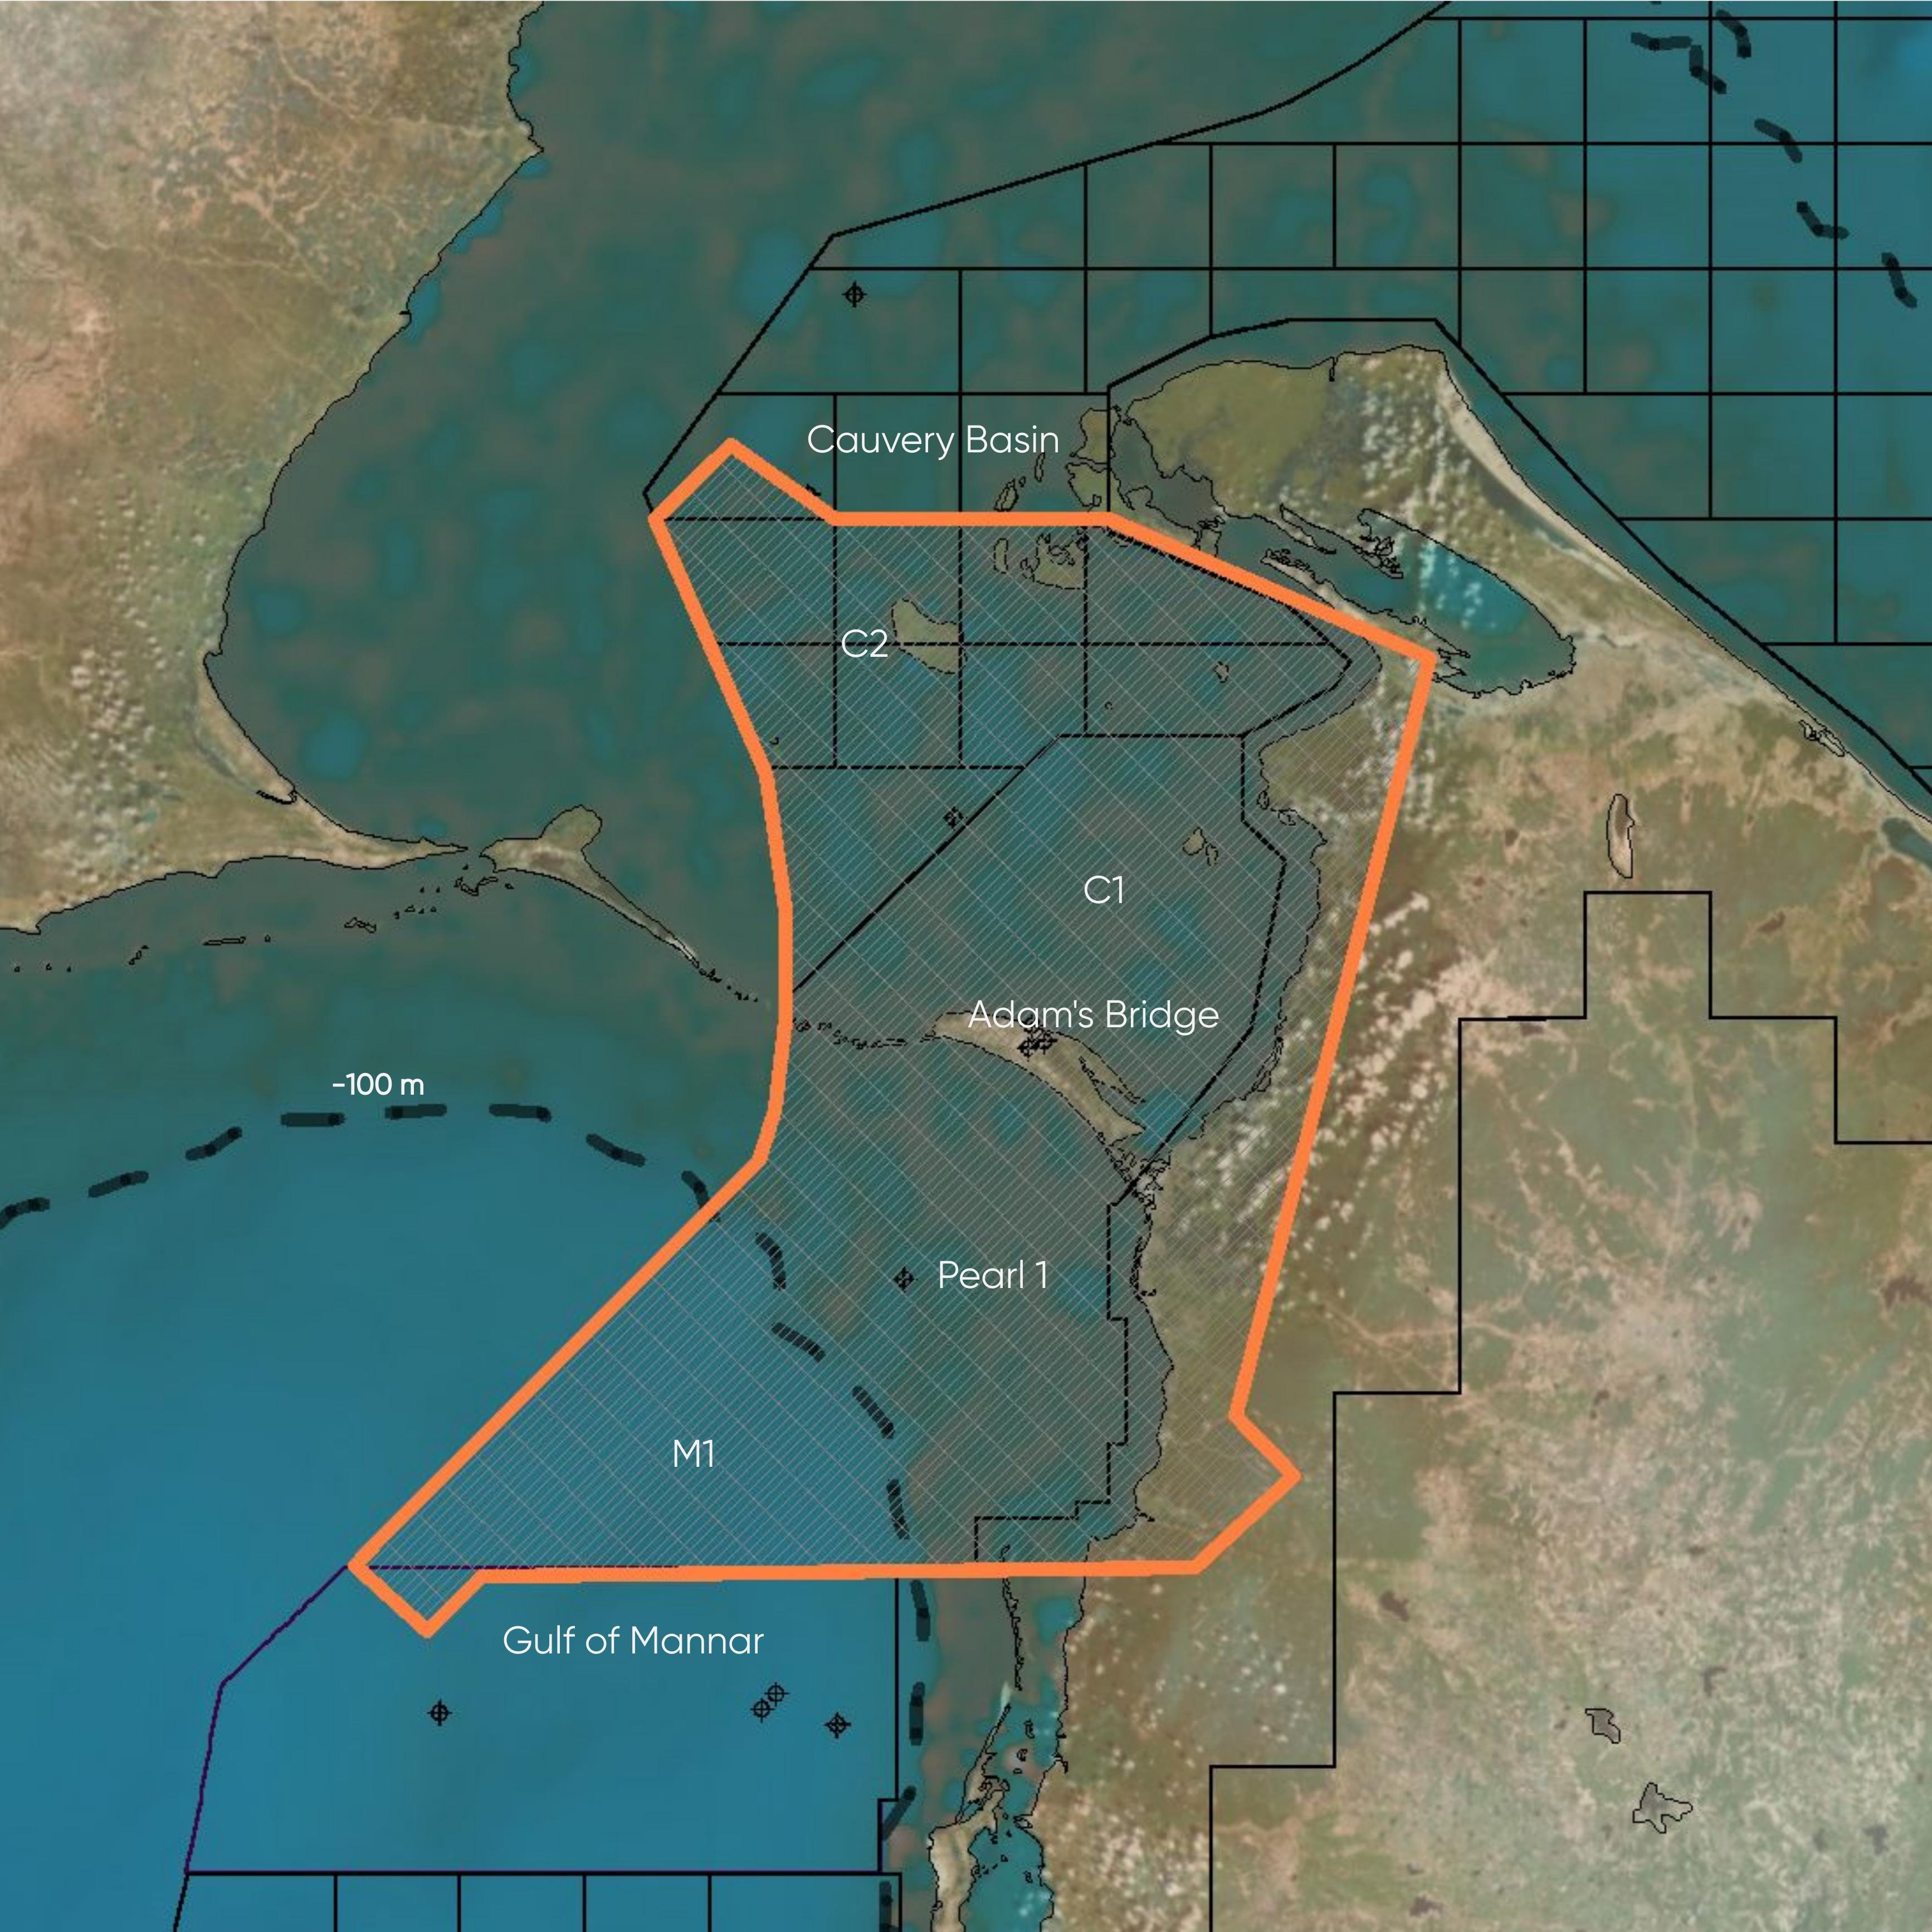 Sri Lanka Bell Geo Website Map - 2021